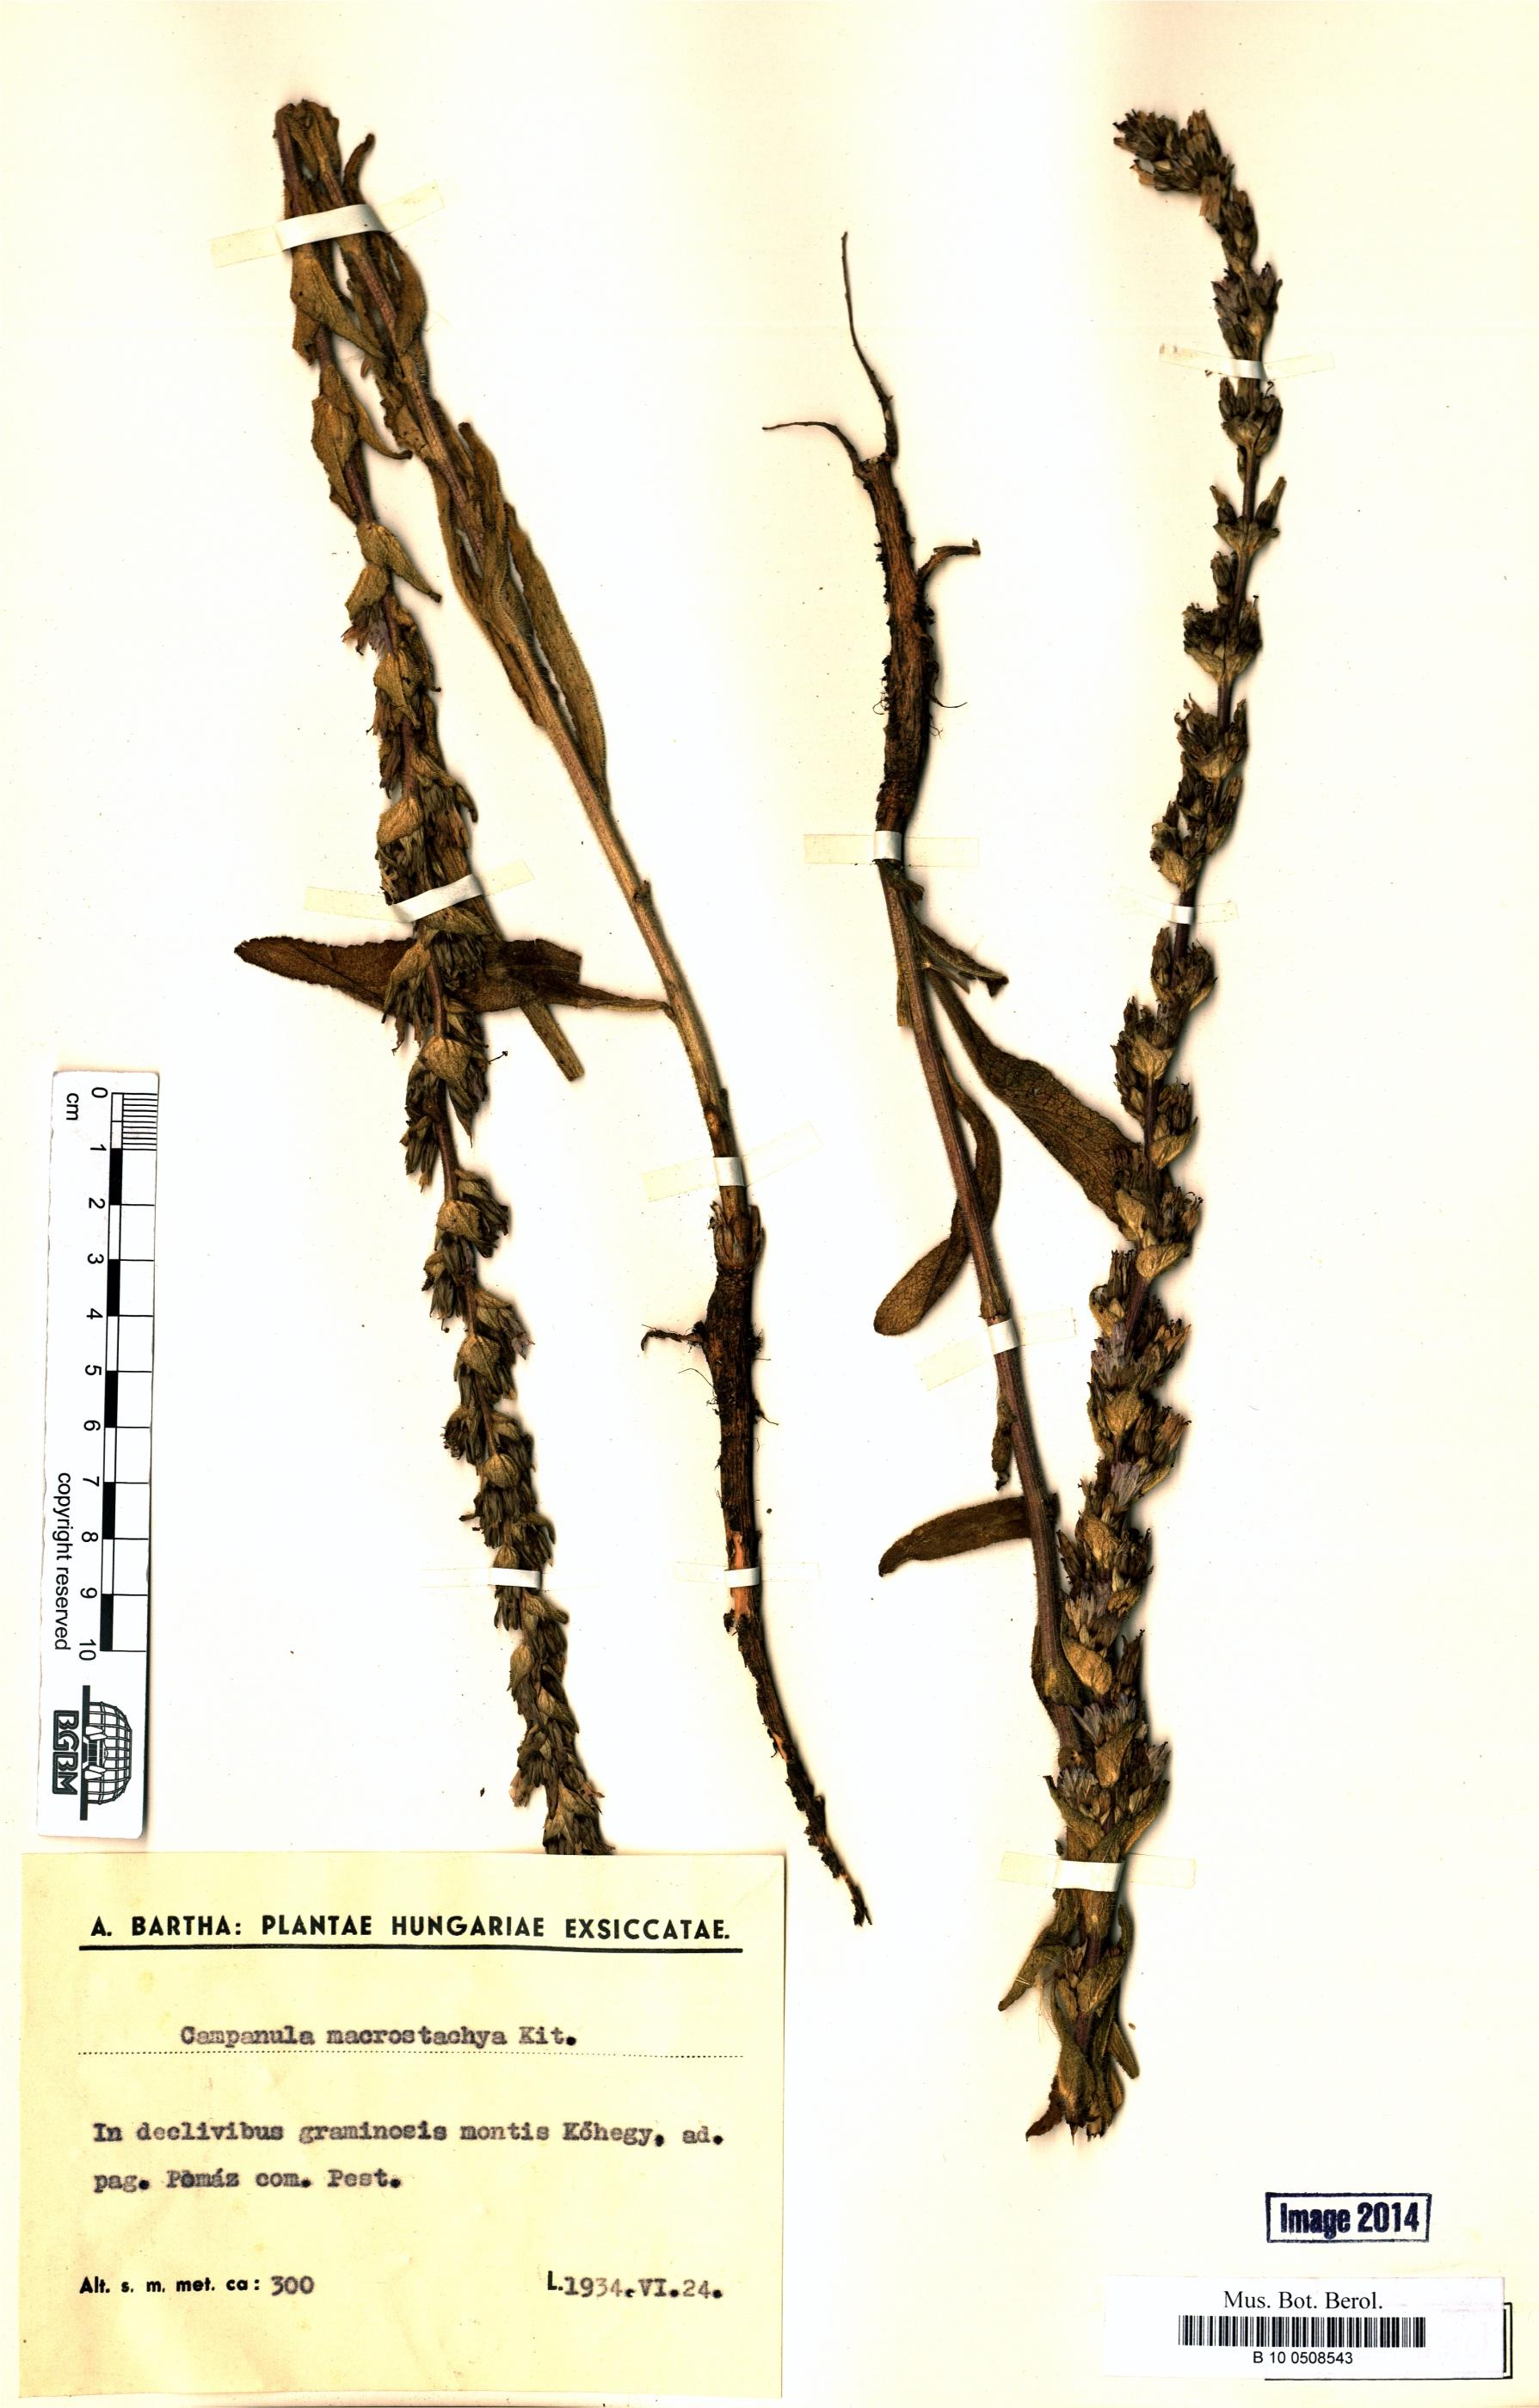 http://ww2.bgbm.org/herbarium/images/B/10/05/08/54/B_10_0508543.jpg